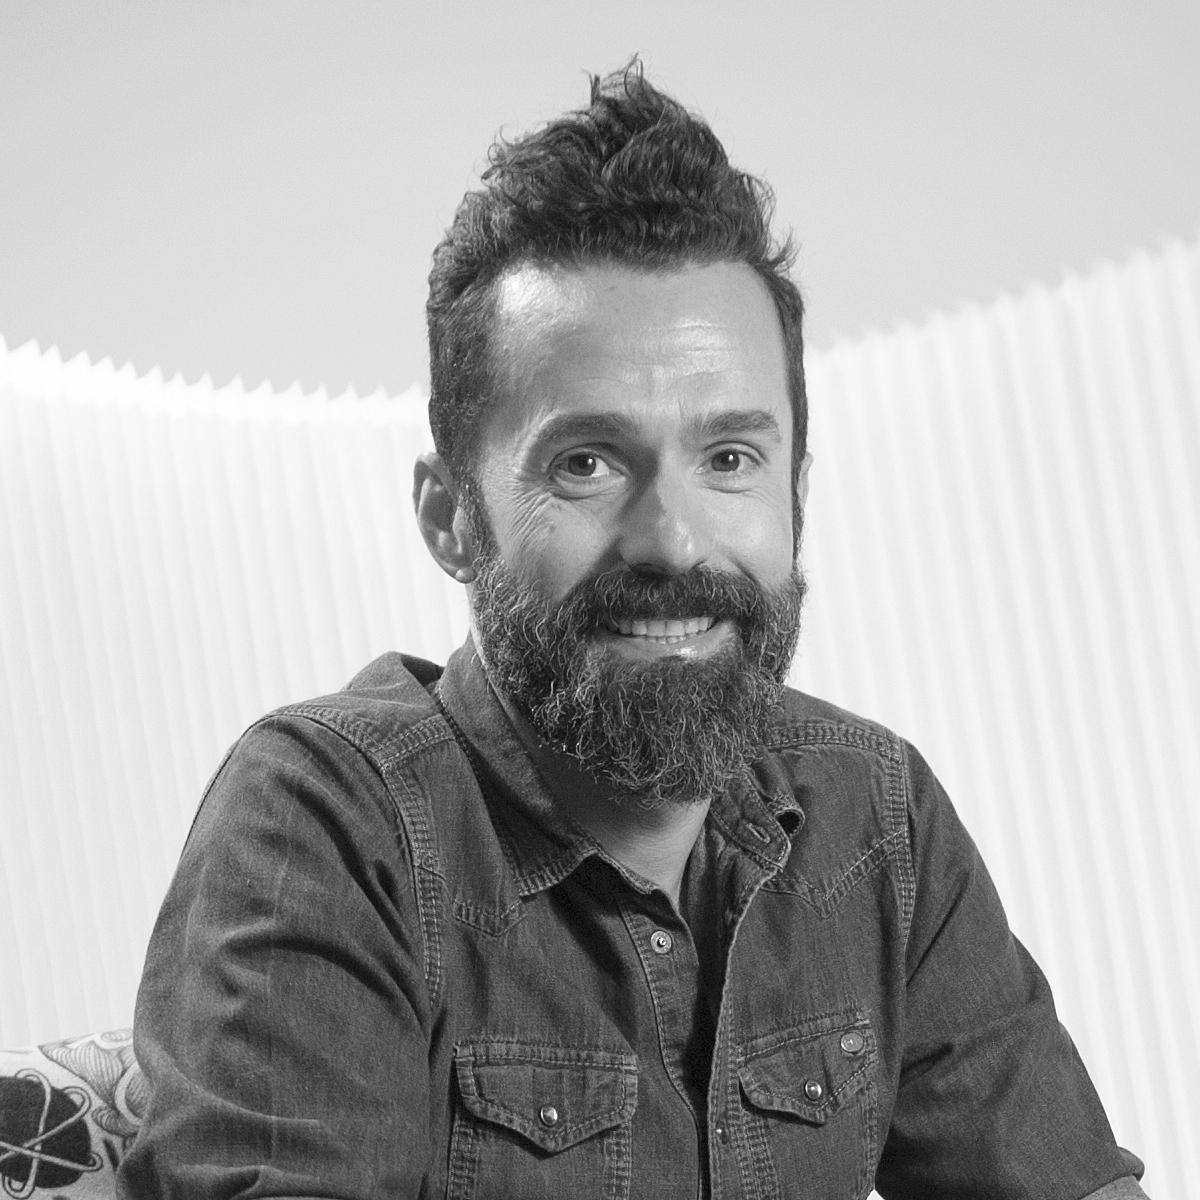 Paco Adin